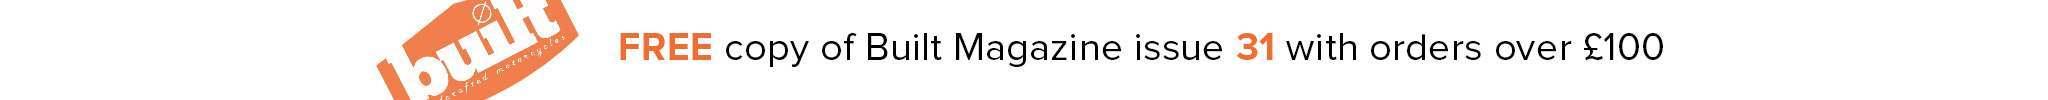 Free Built magazine